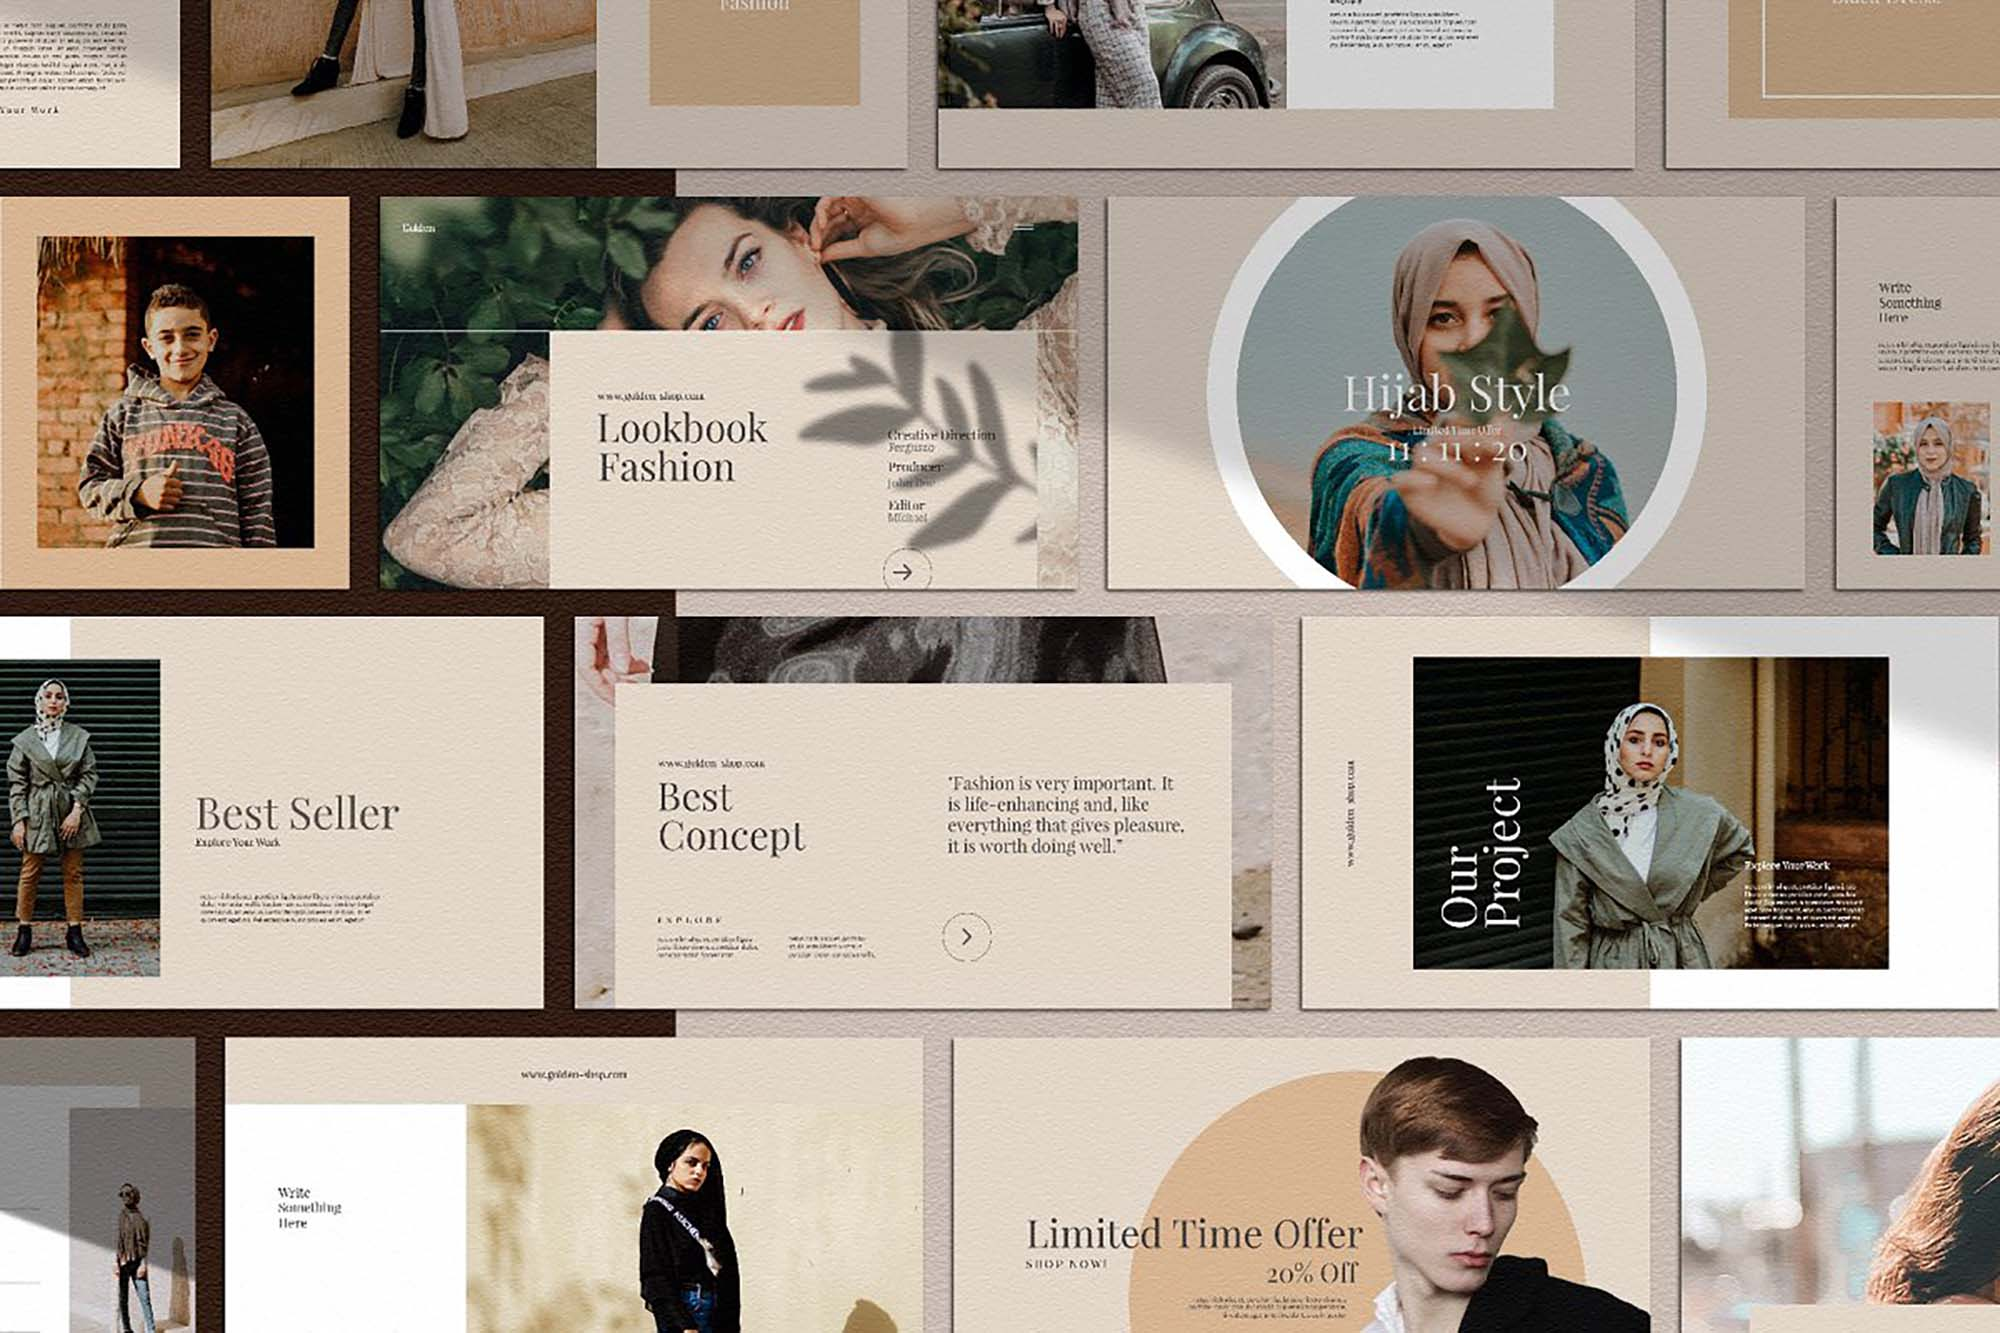 Golden Lookbook Fashion Powerpoint